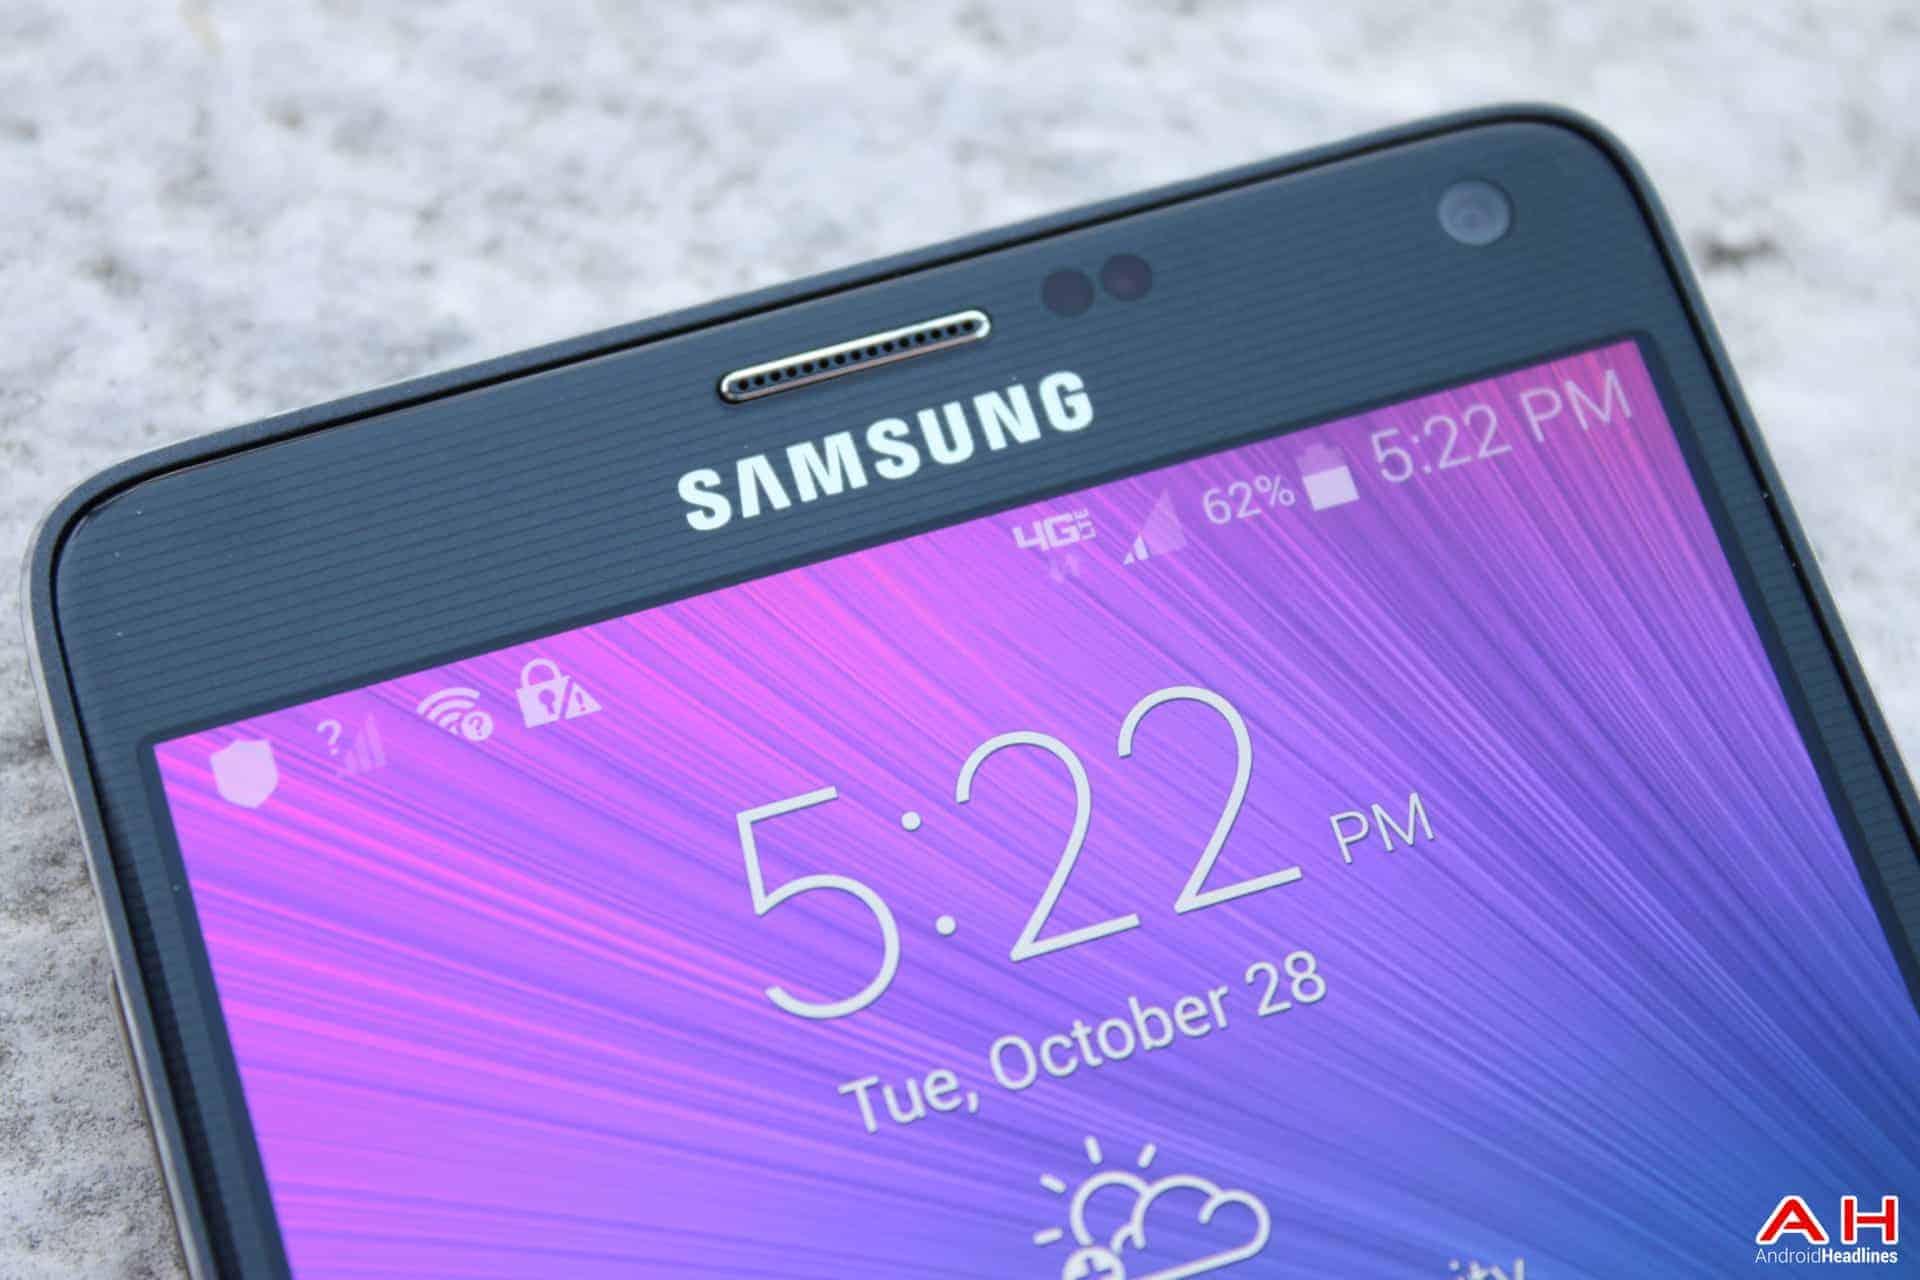 AH Samsung Galaxy Note 4-28